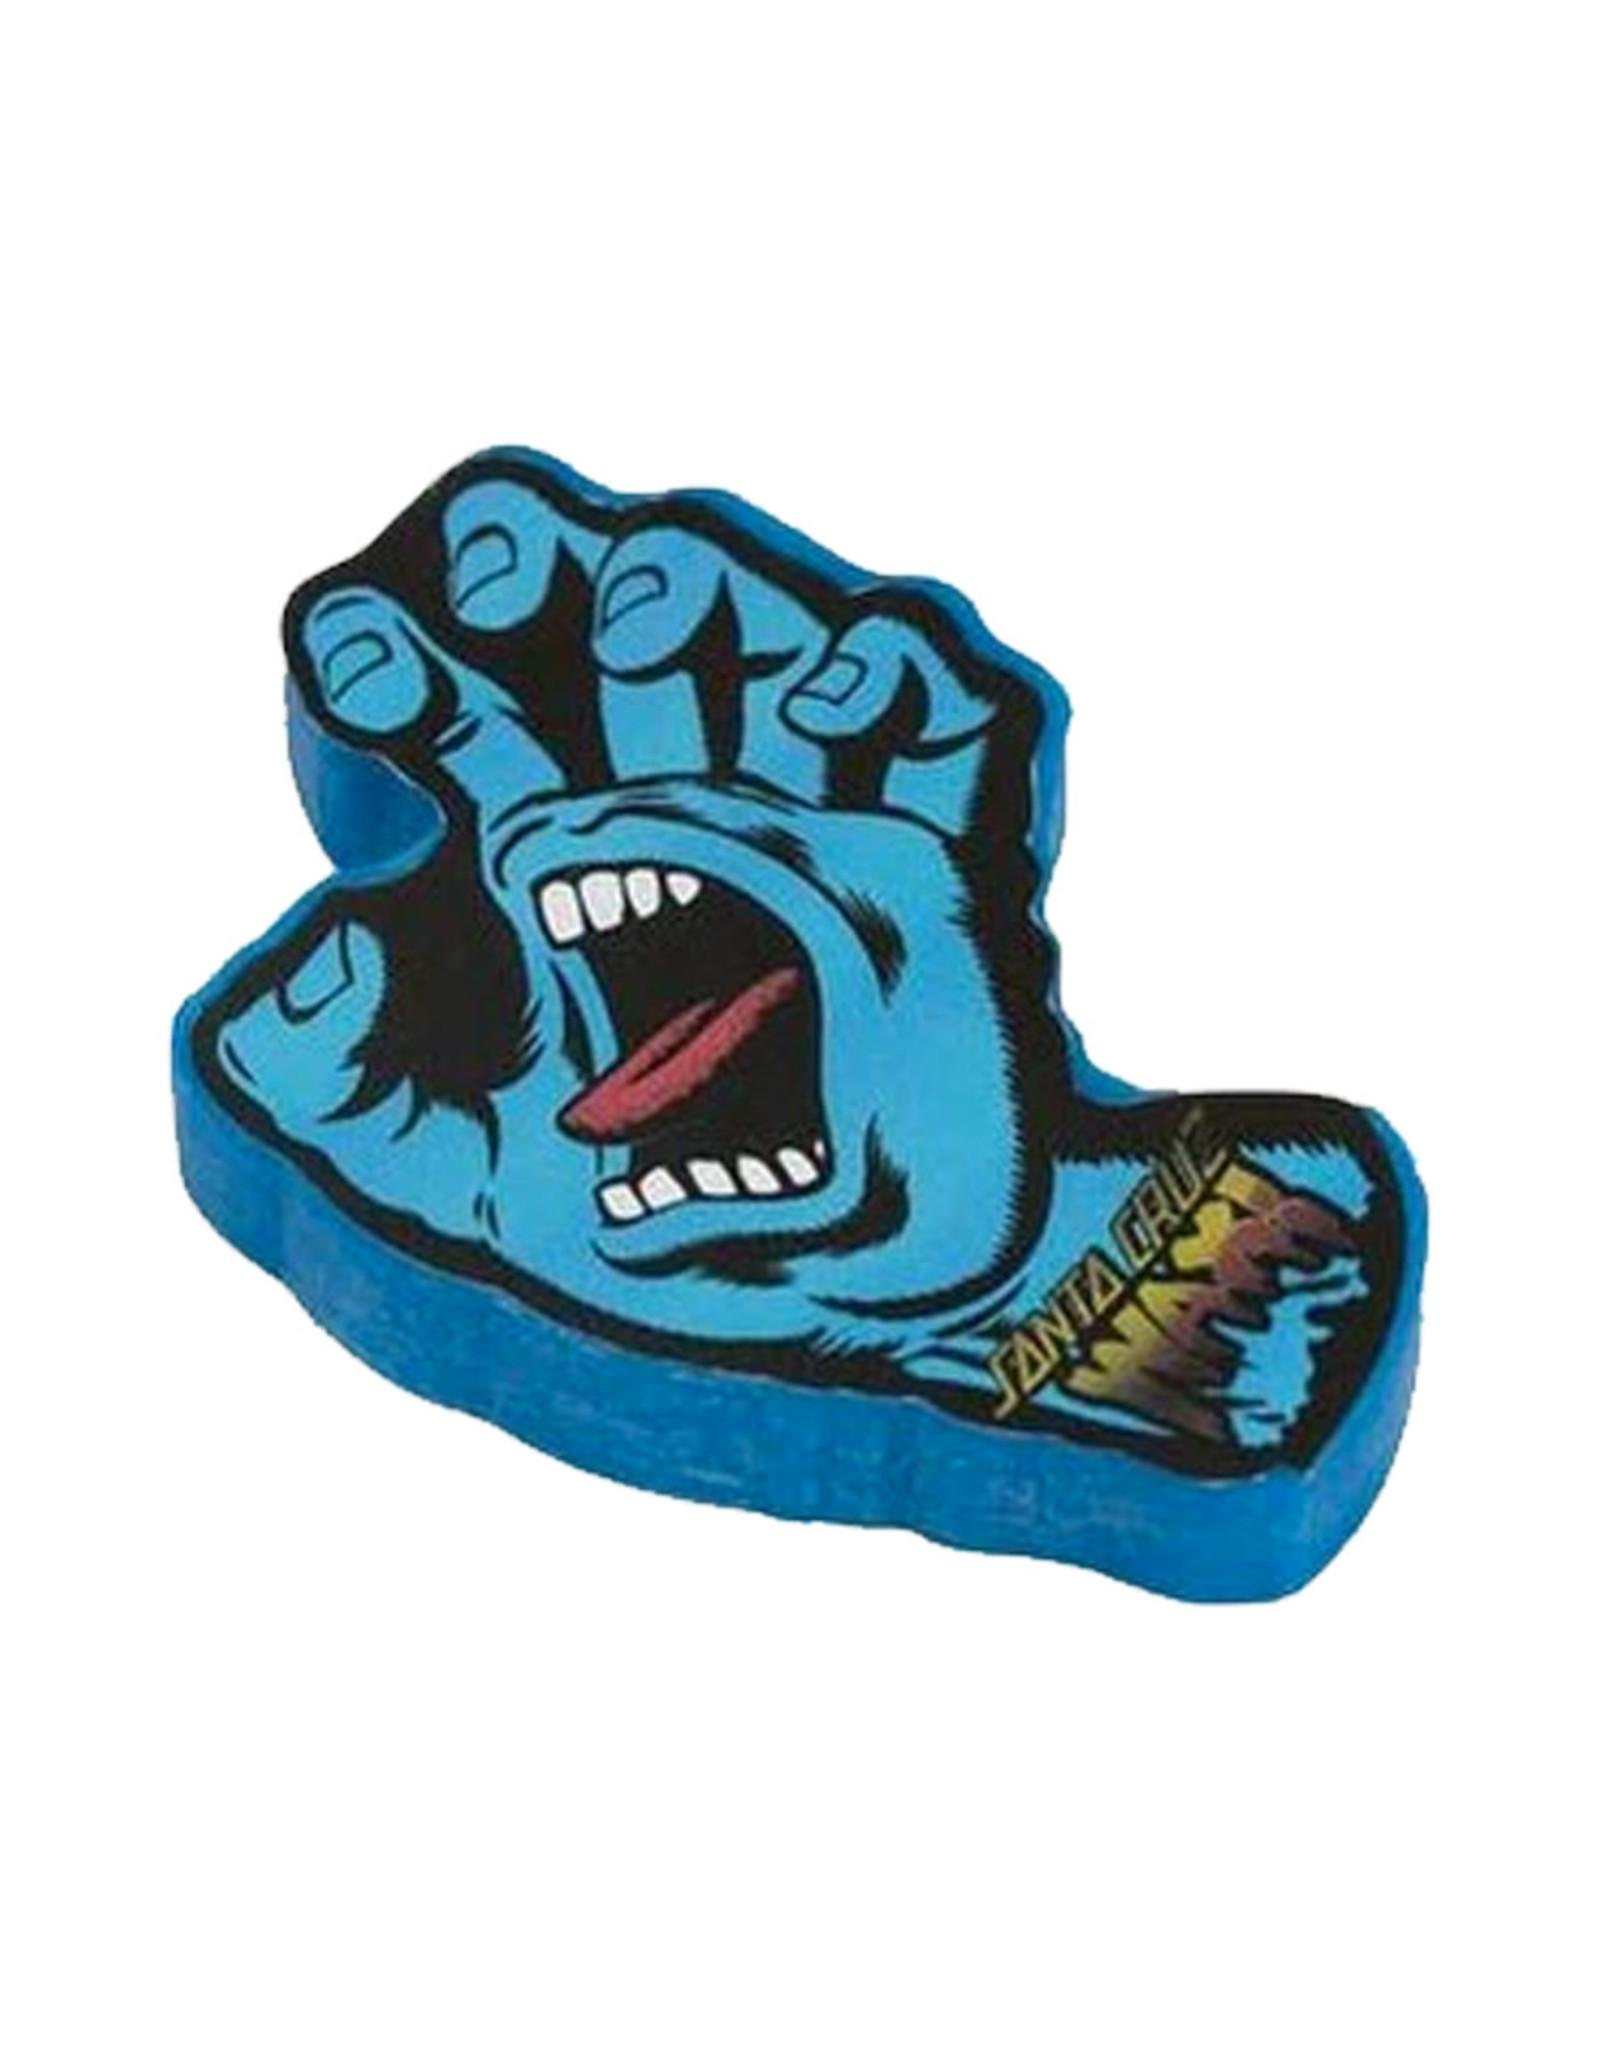 Santa Cruz Santa Cruz Wax Screaming Hand (Blue)